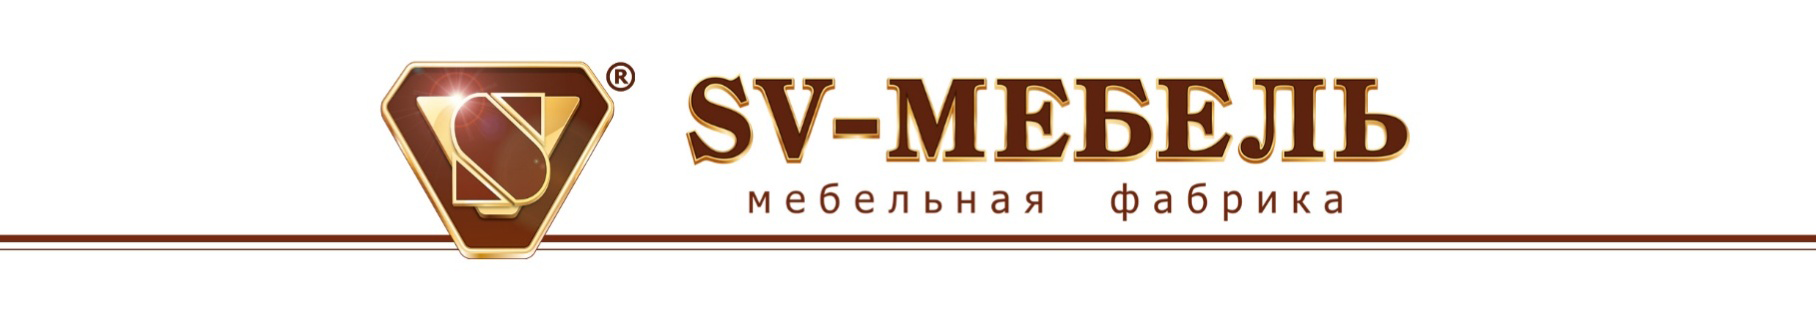 SV-МЕБЕЛЬ г. Мытищи